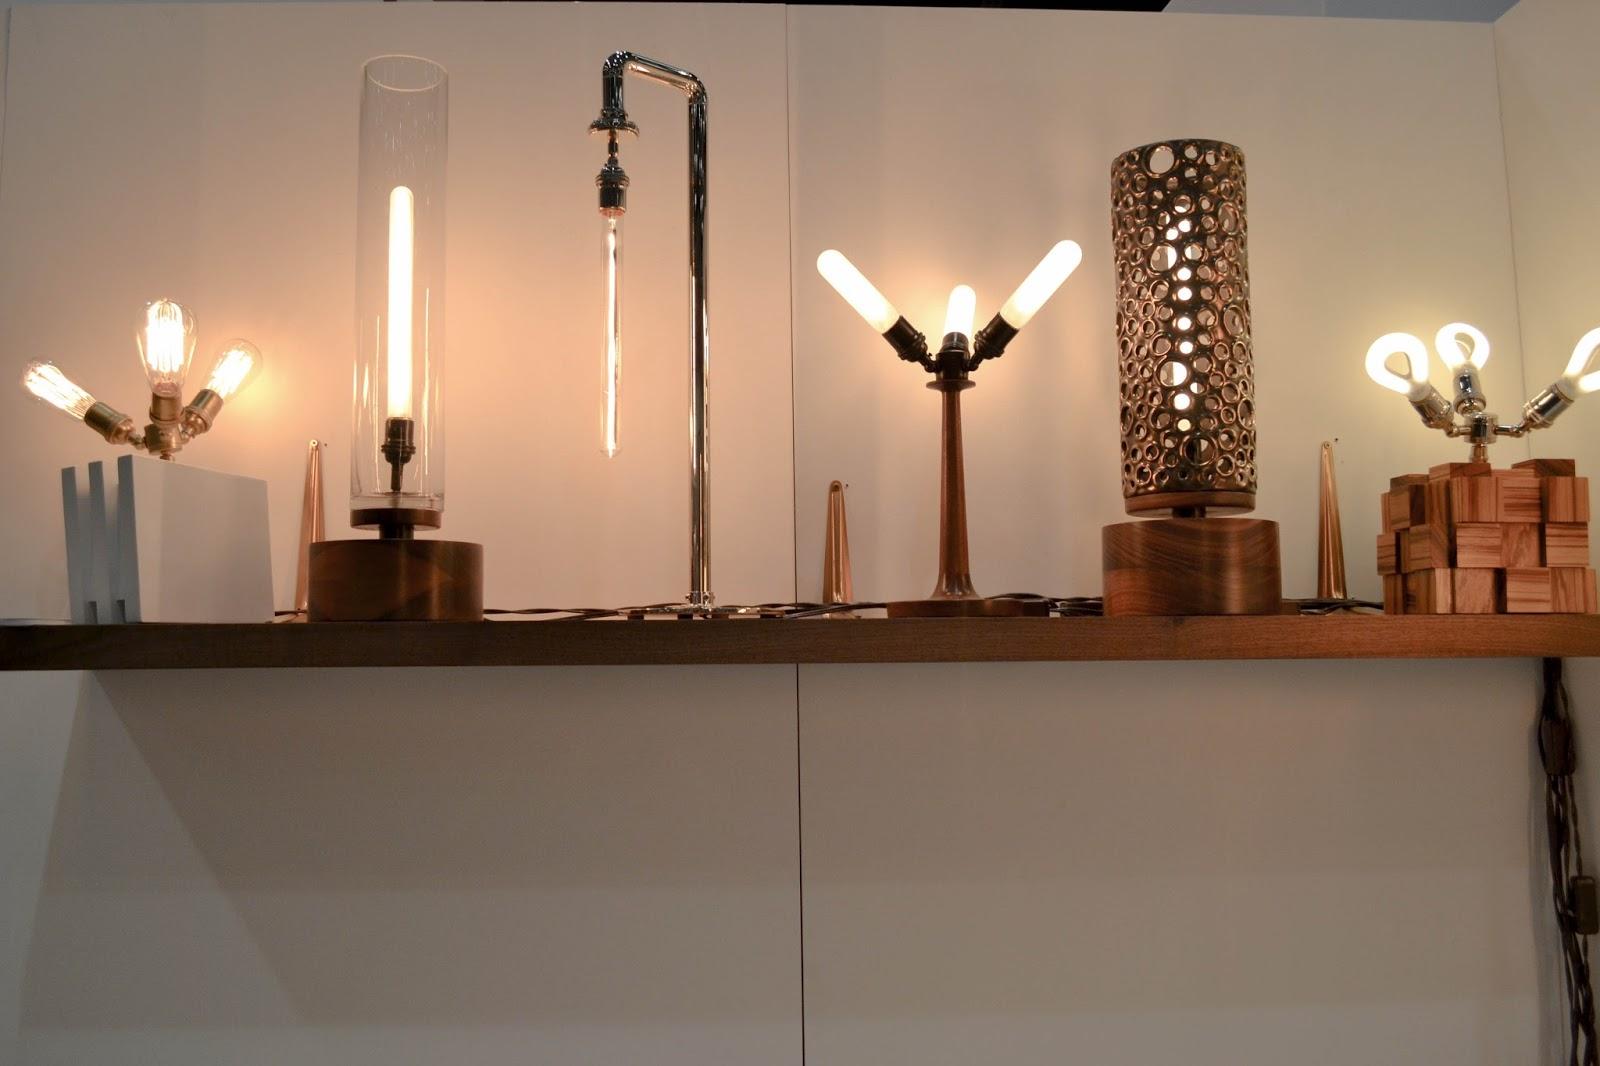 seth parks inspirational lighting designs. Lighting From WhyrHymer Seth Parks Inspirational Designs